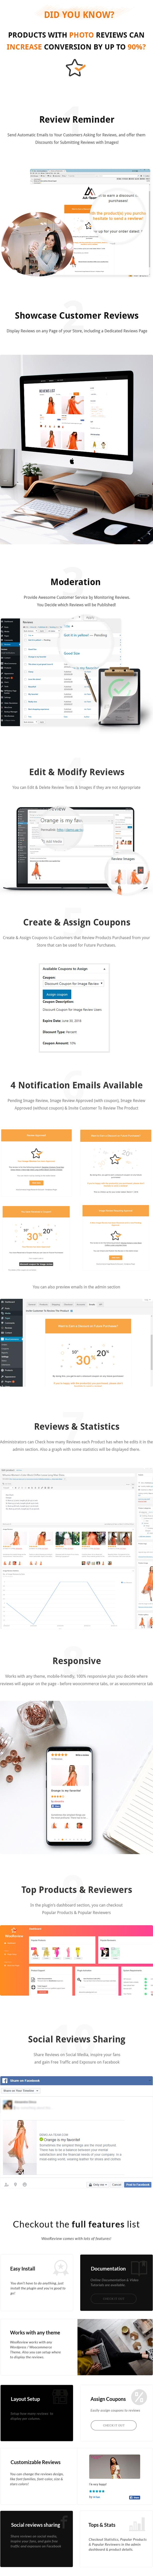 WooCommerce Image Review für Discount - WordPress Plugin - 1